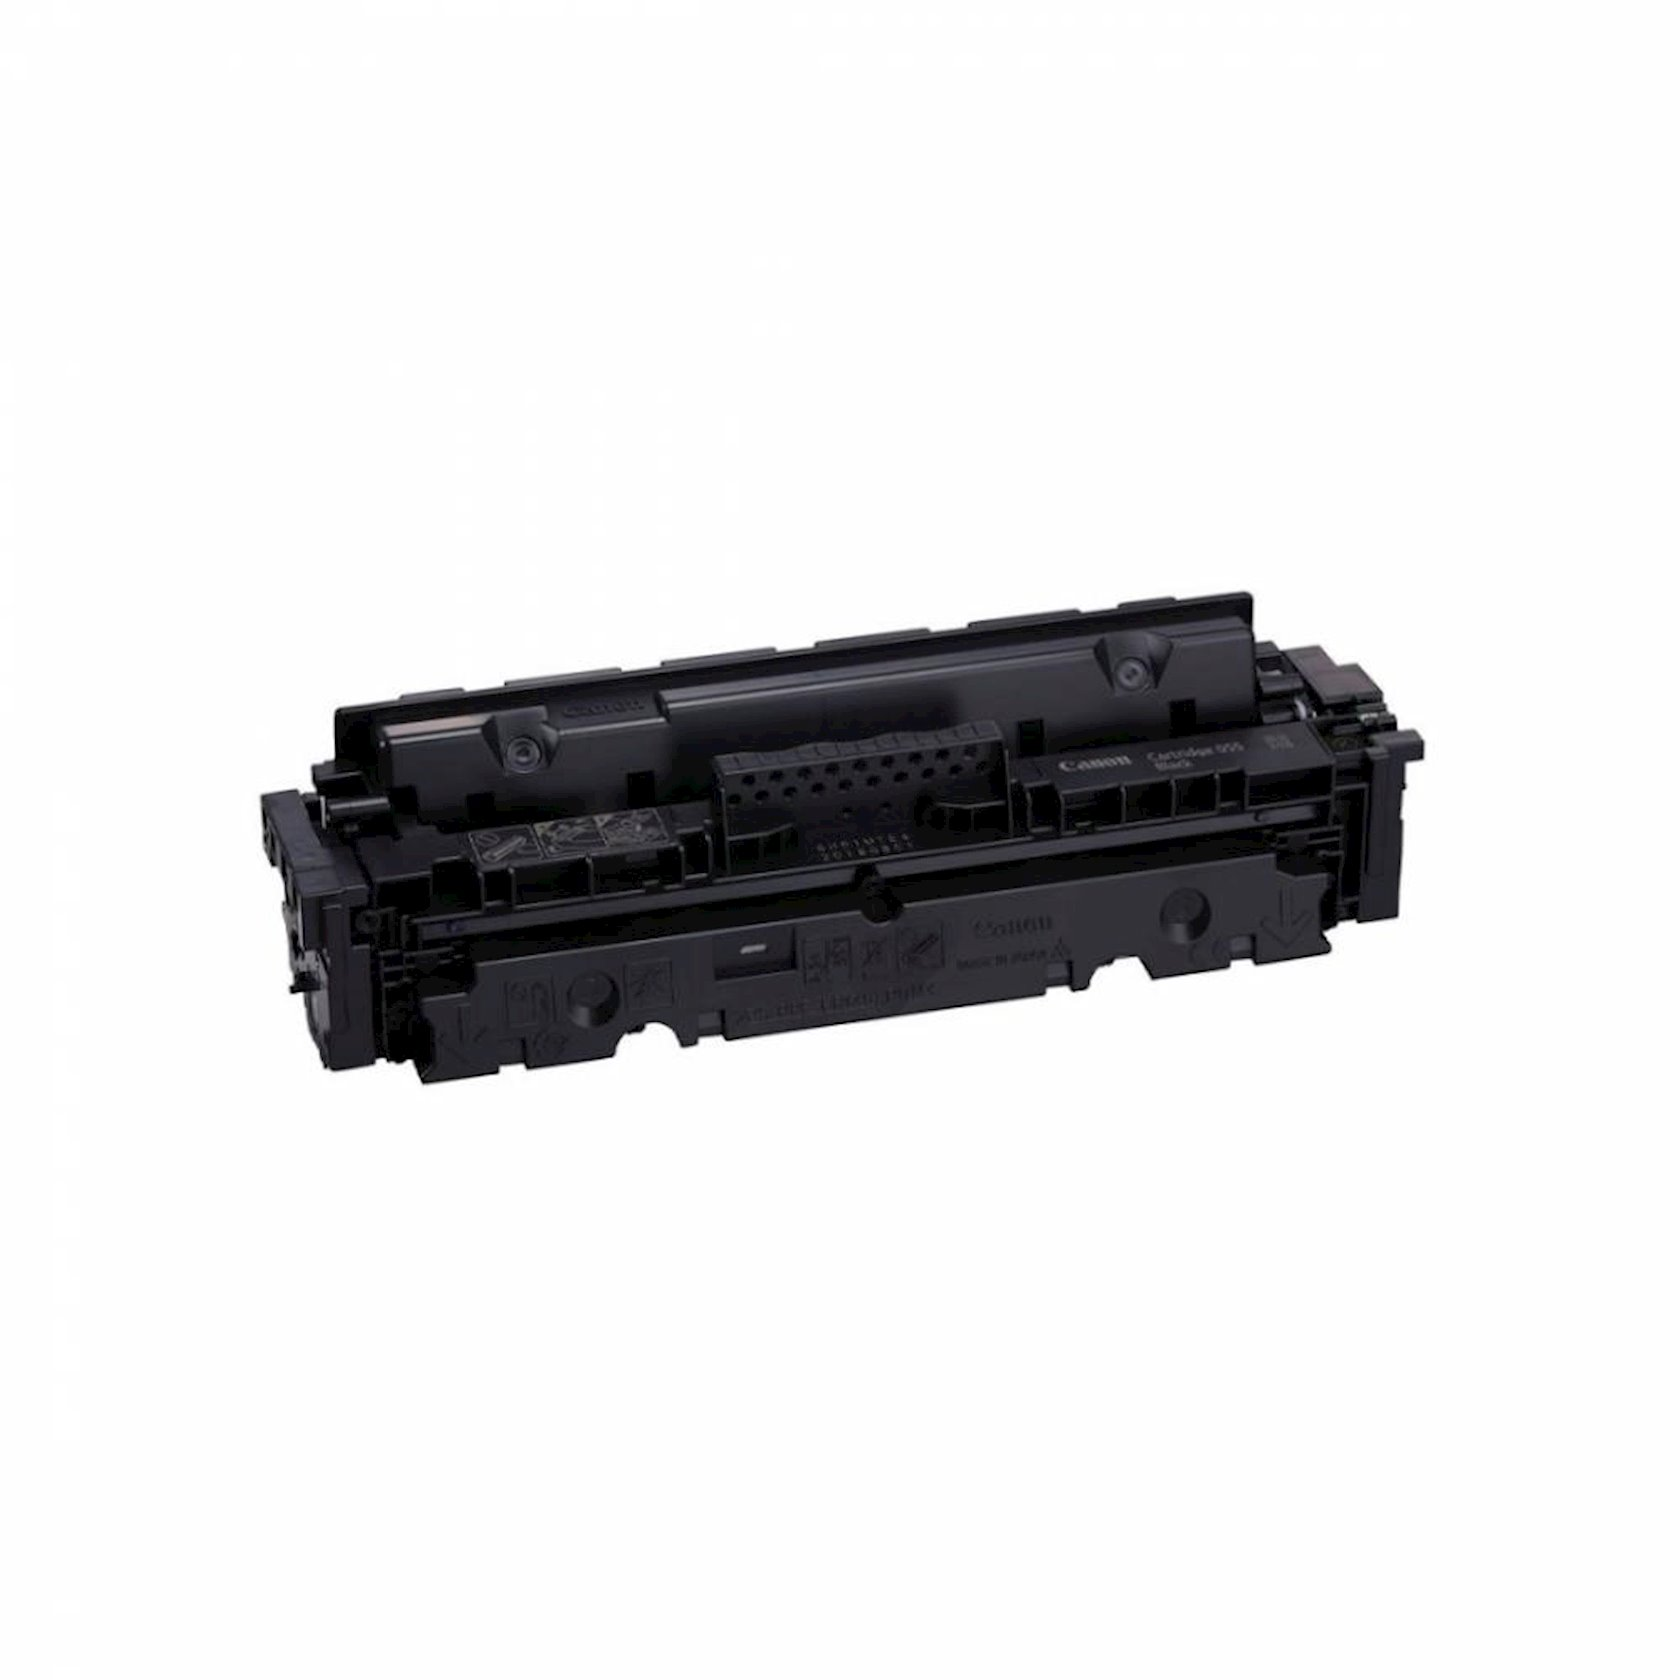 Toner-kartric Canon CRG 055 Magenta bənövşəyi